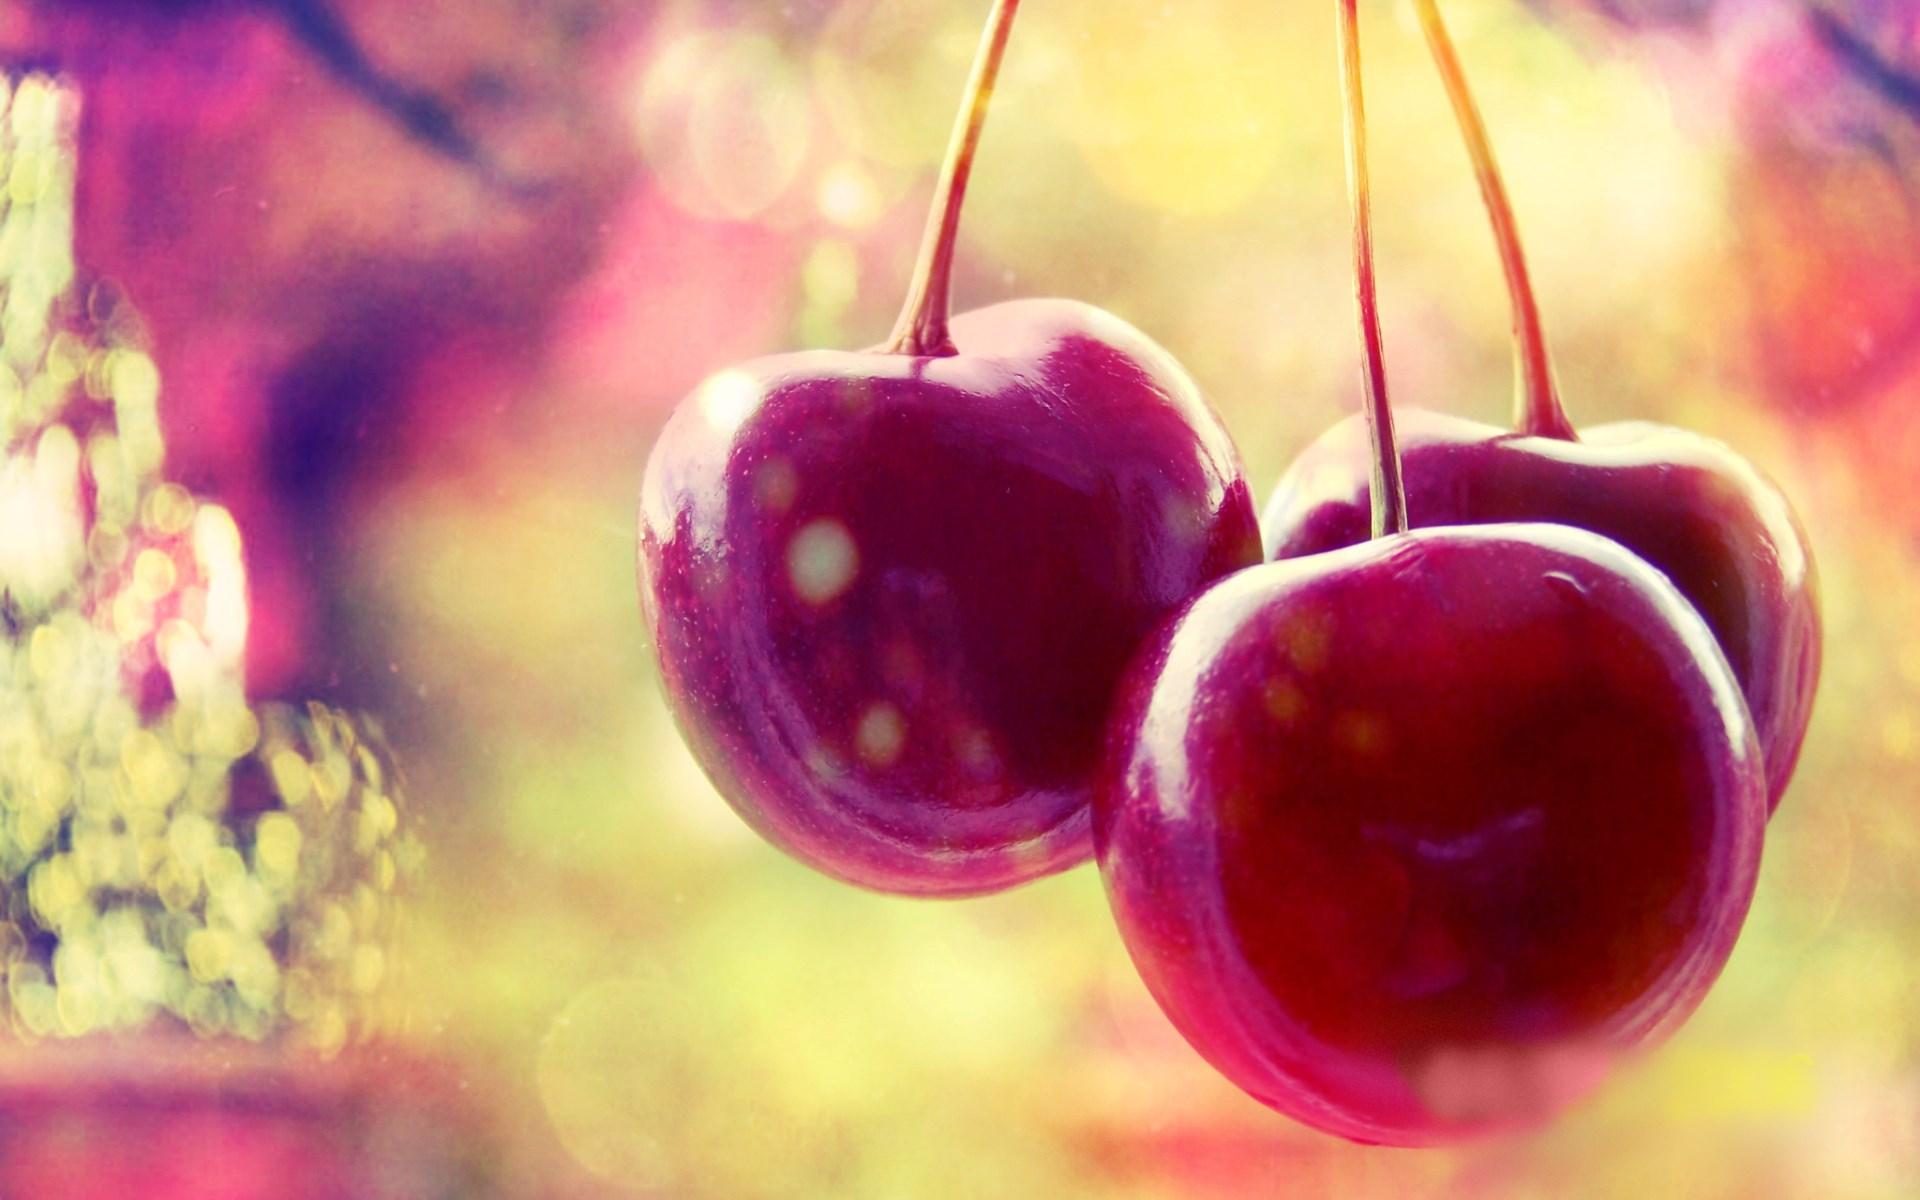 3d Name Wallpapers R Cherries Fruits Hd Desktop Wallpapers 4k Hd